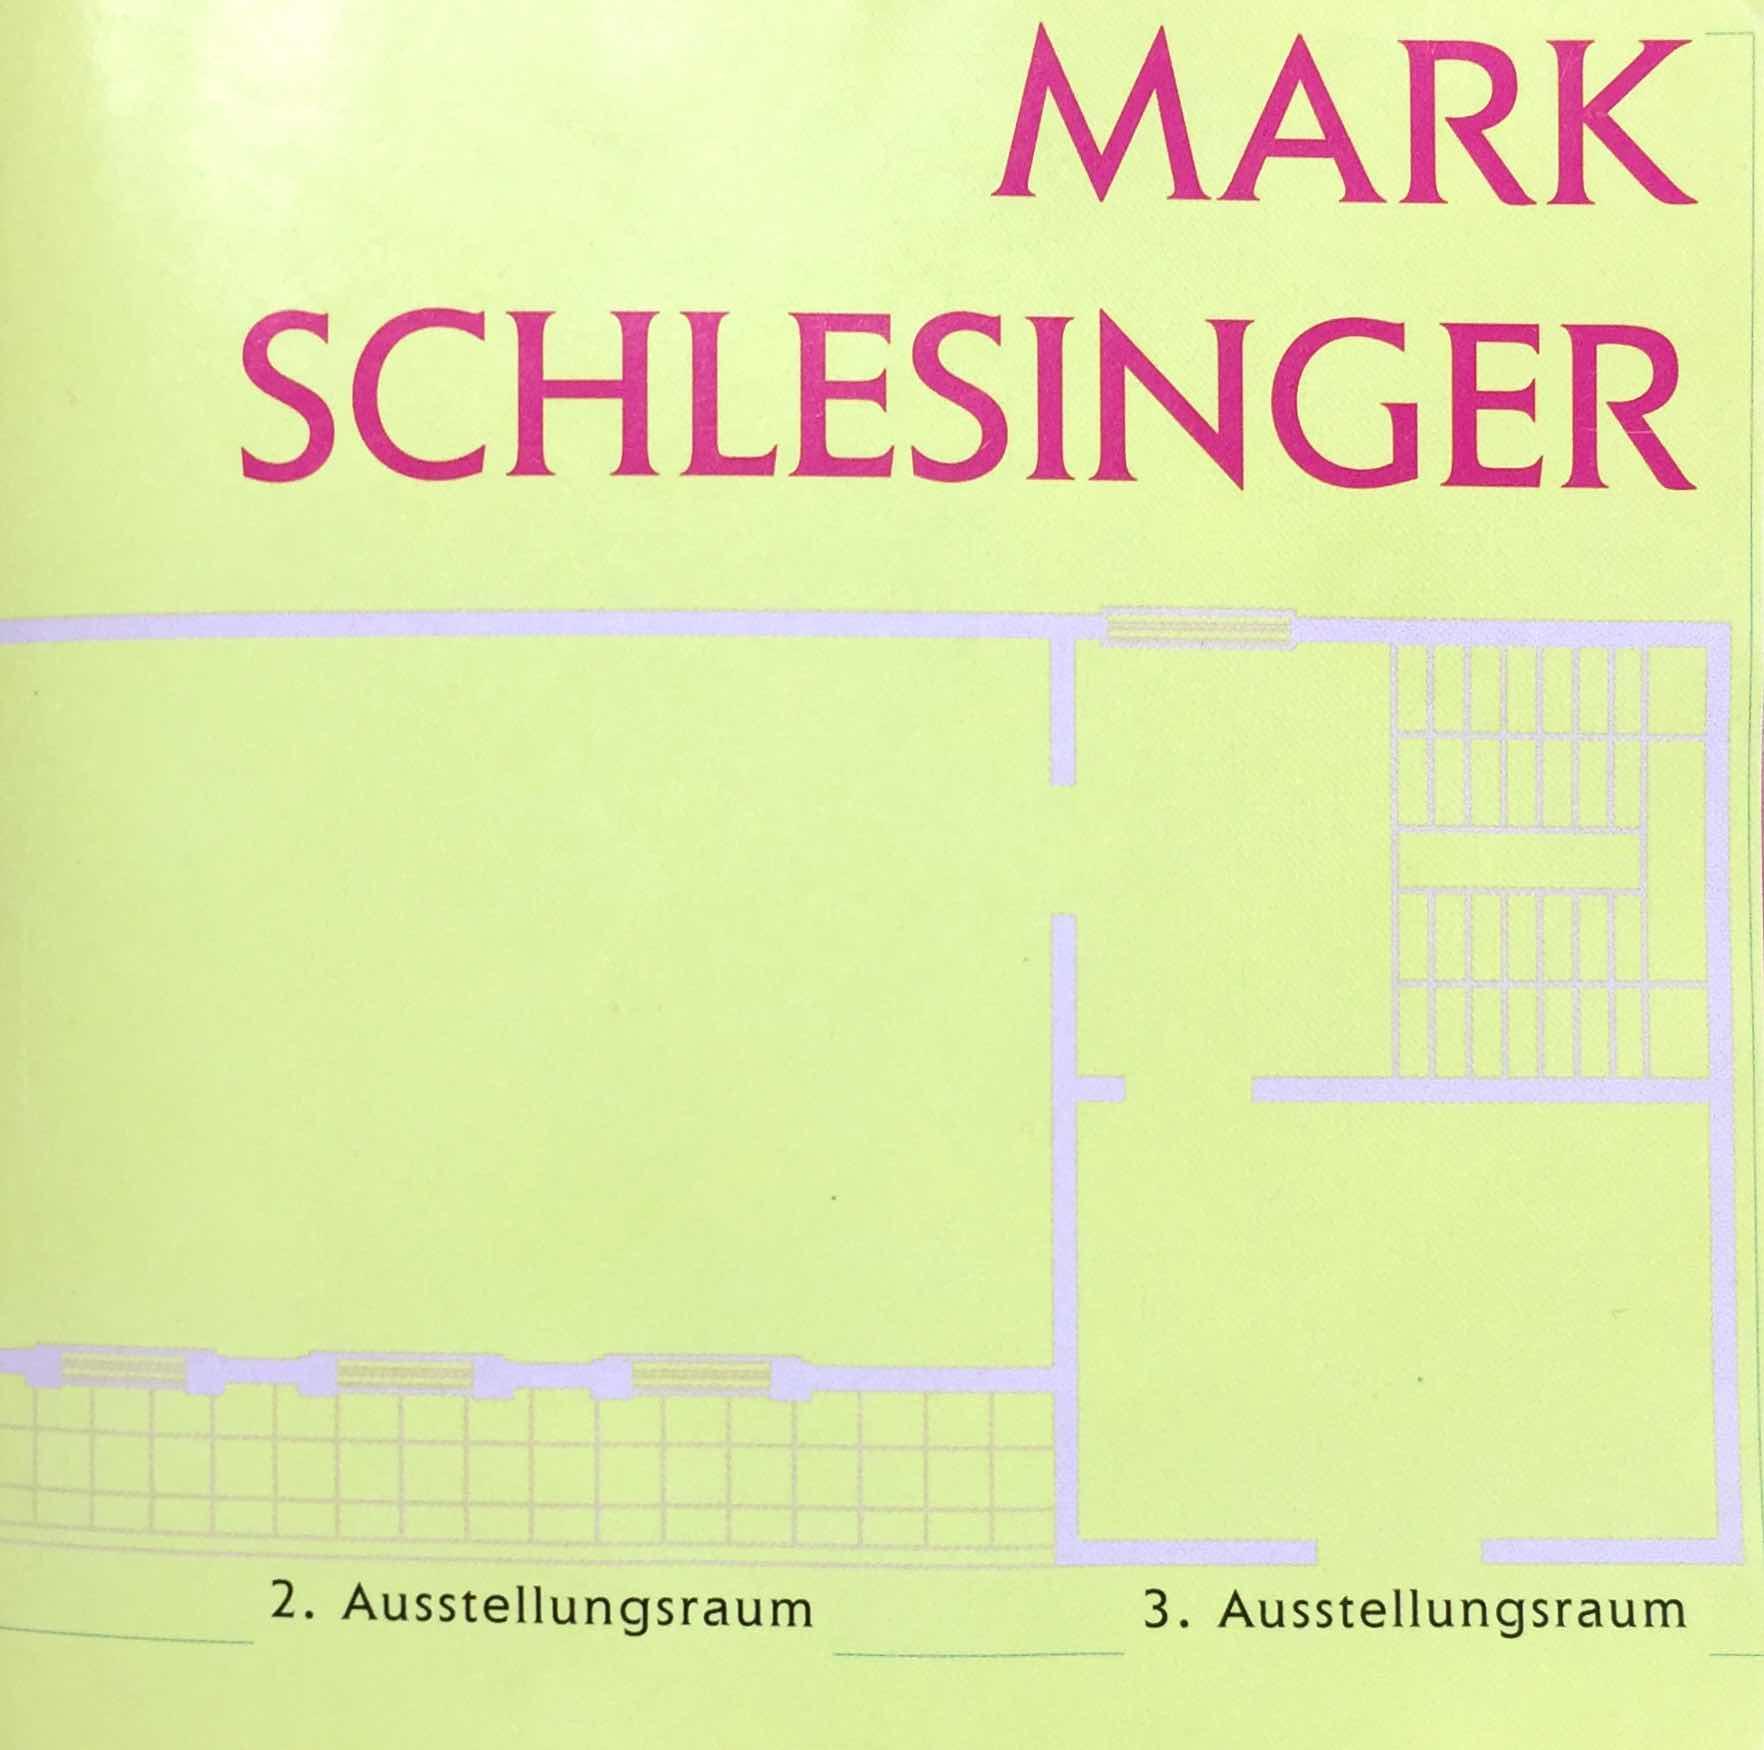 Download Catalog   Mark Schlesinger  Poem by Albert Mobilio. Held , Over for Mark Schlesinger.  1995. Rolf Hengesbach, Wuppertal, Germany.